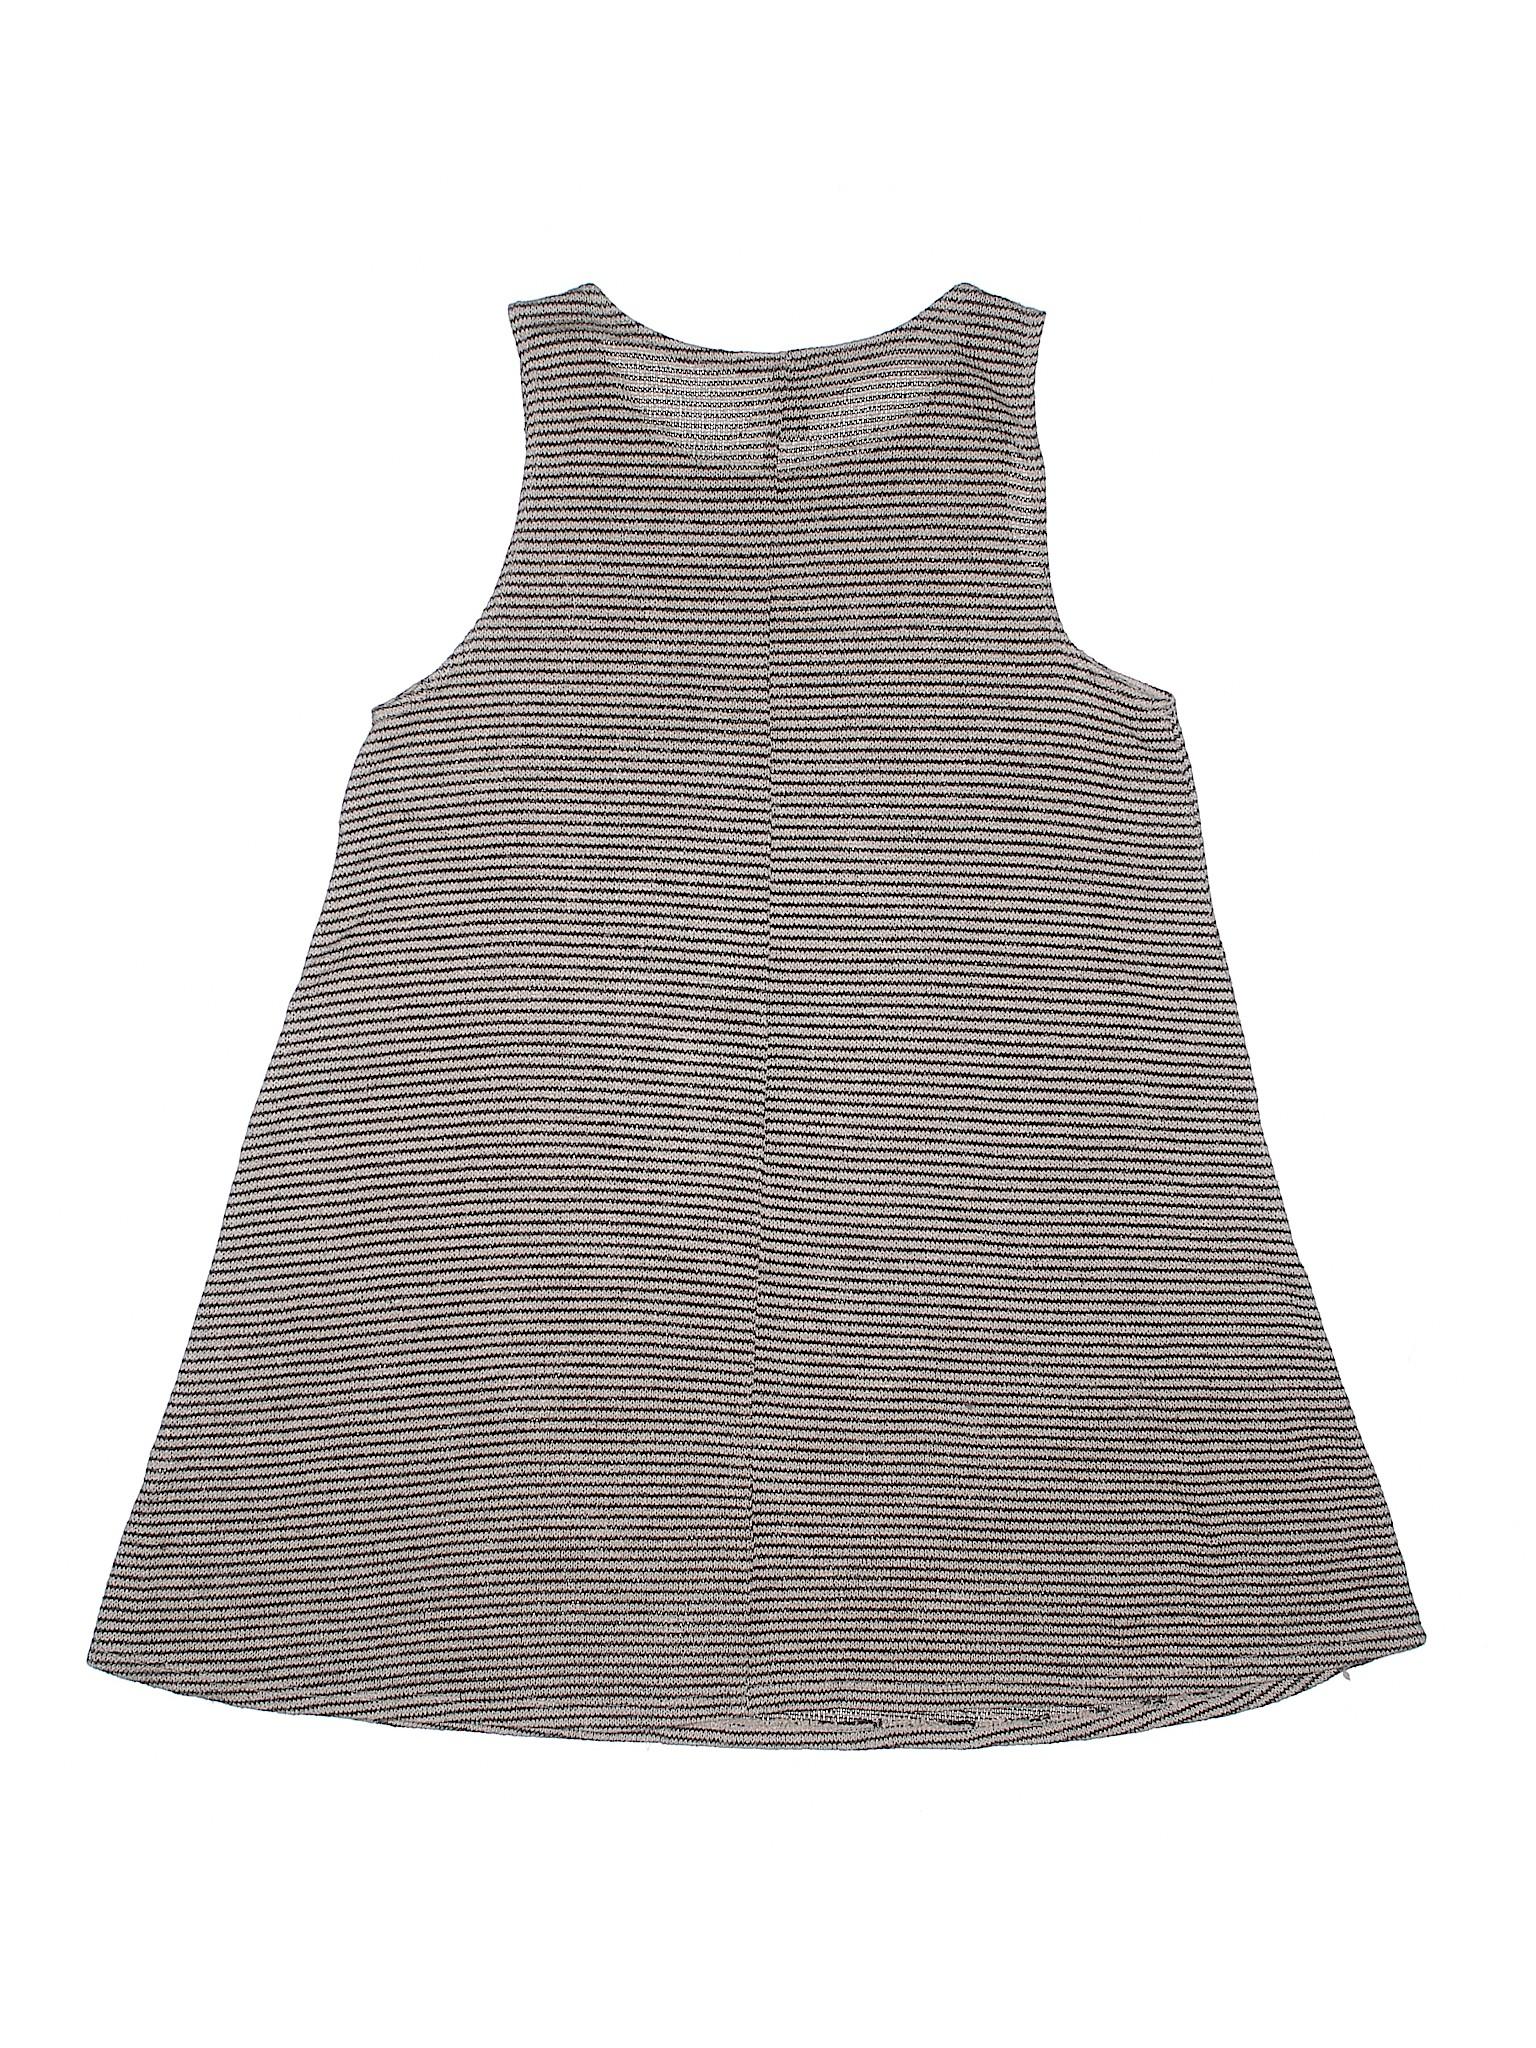 Casual Dress winter Forever Boutique 21 nHwaZ6qw